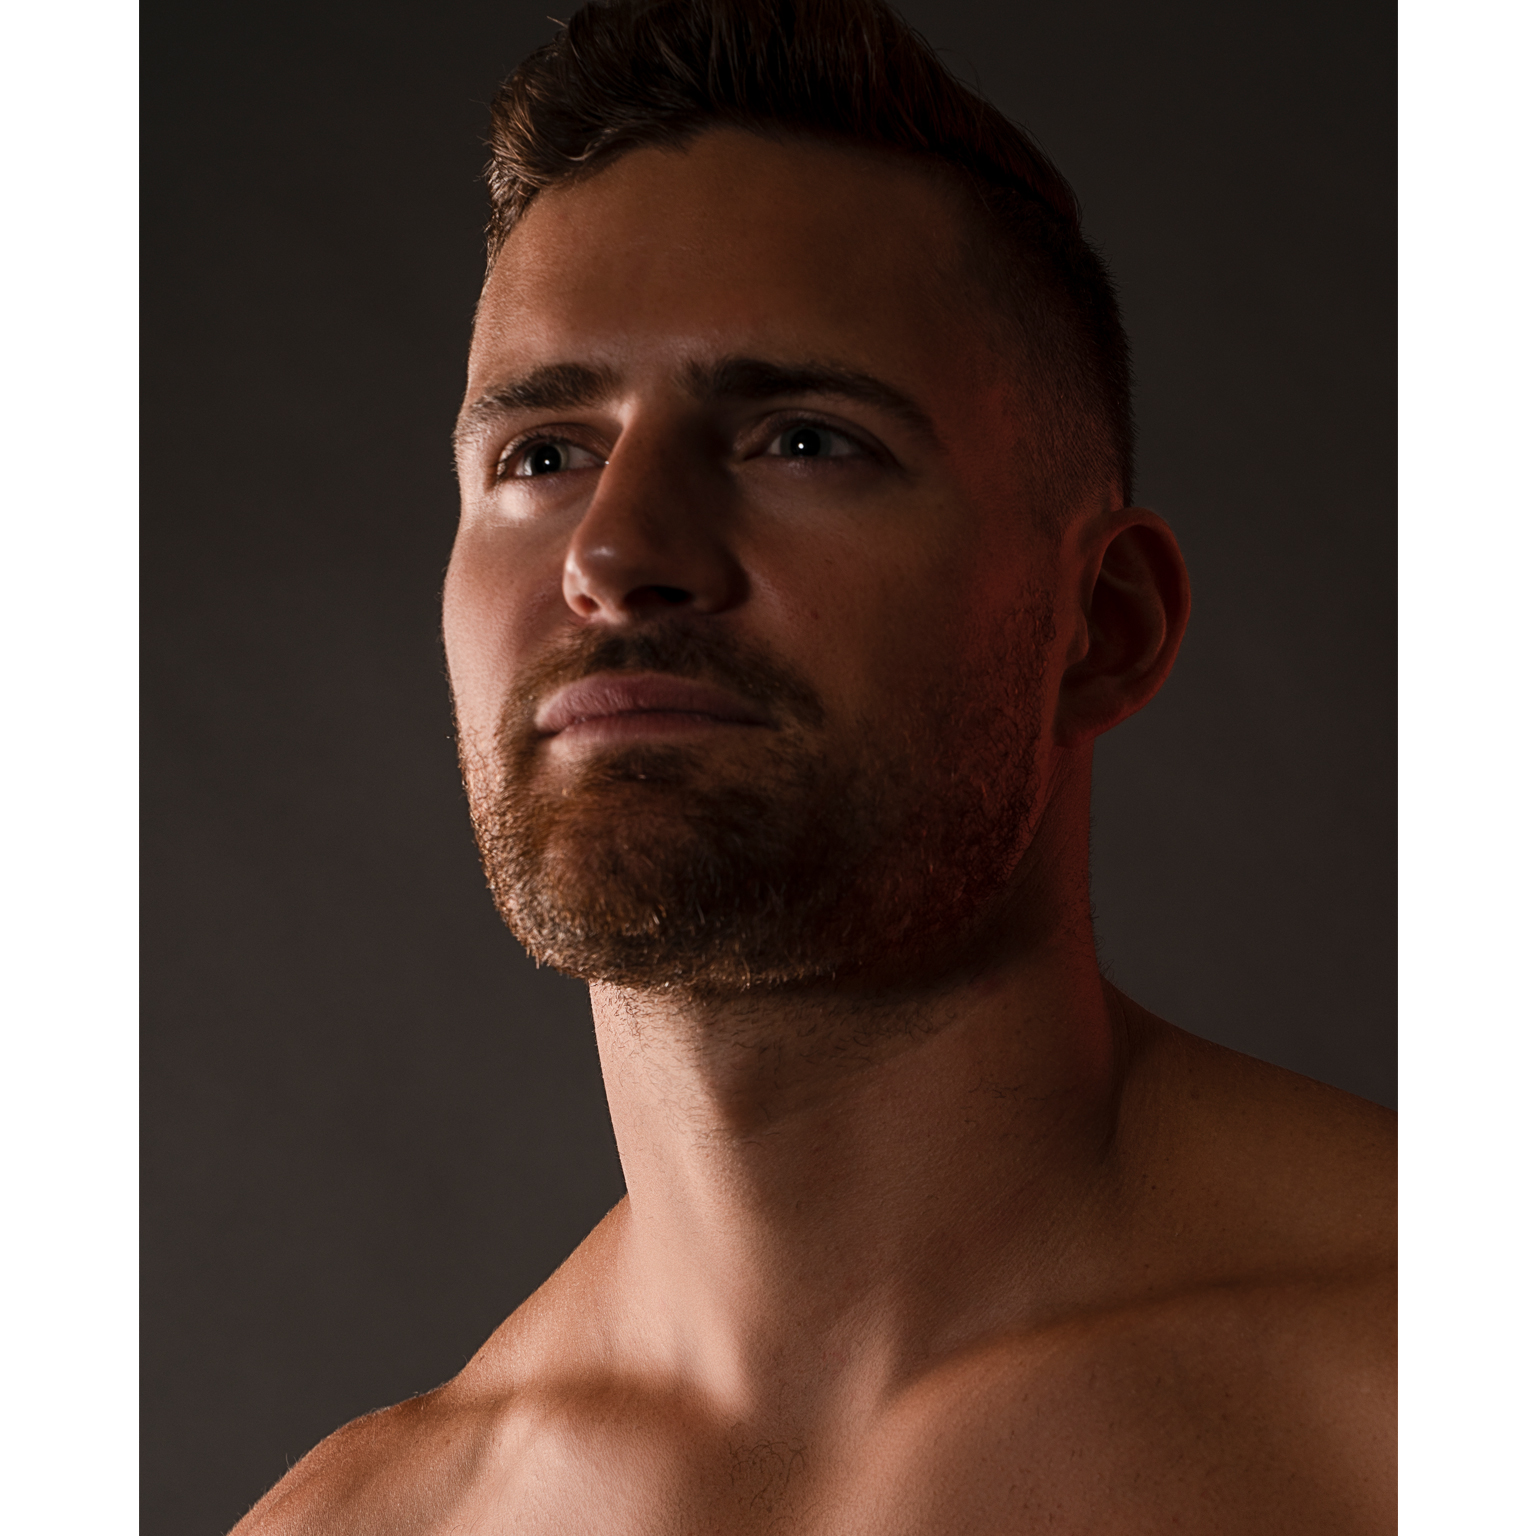 Toronto-Fitness-Model-Agency-Shirtless-Portrait-Justin-Baker